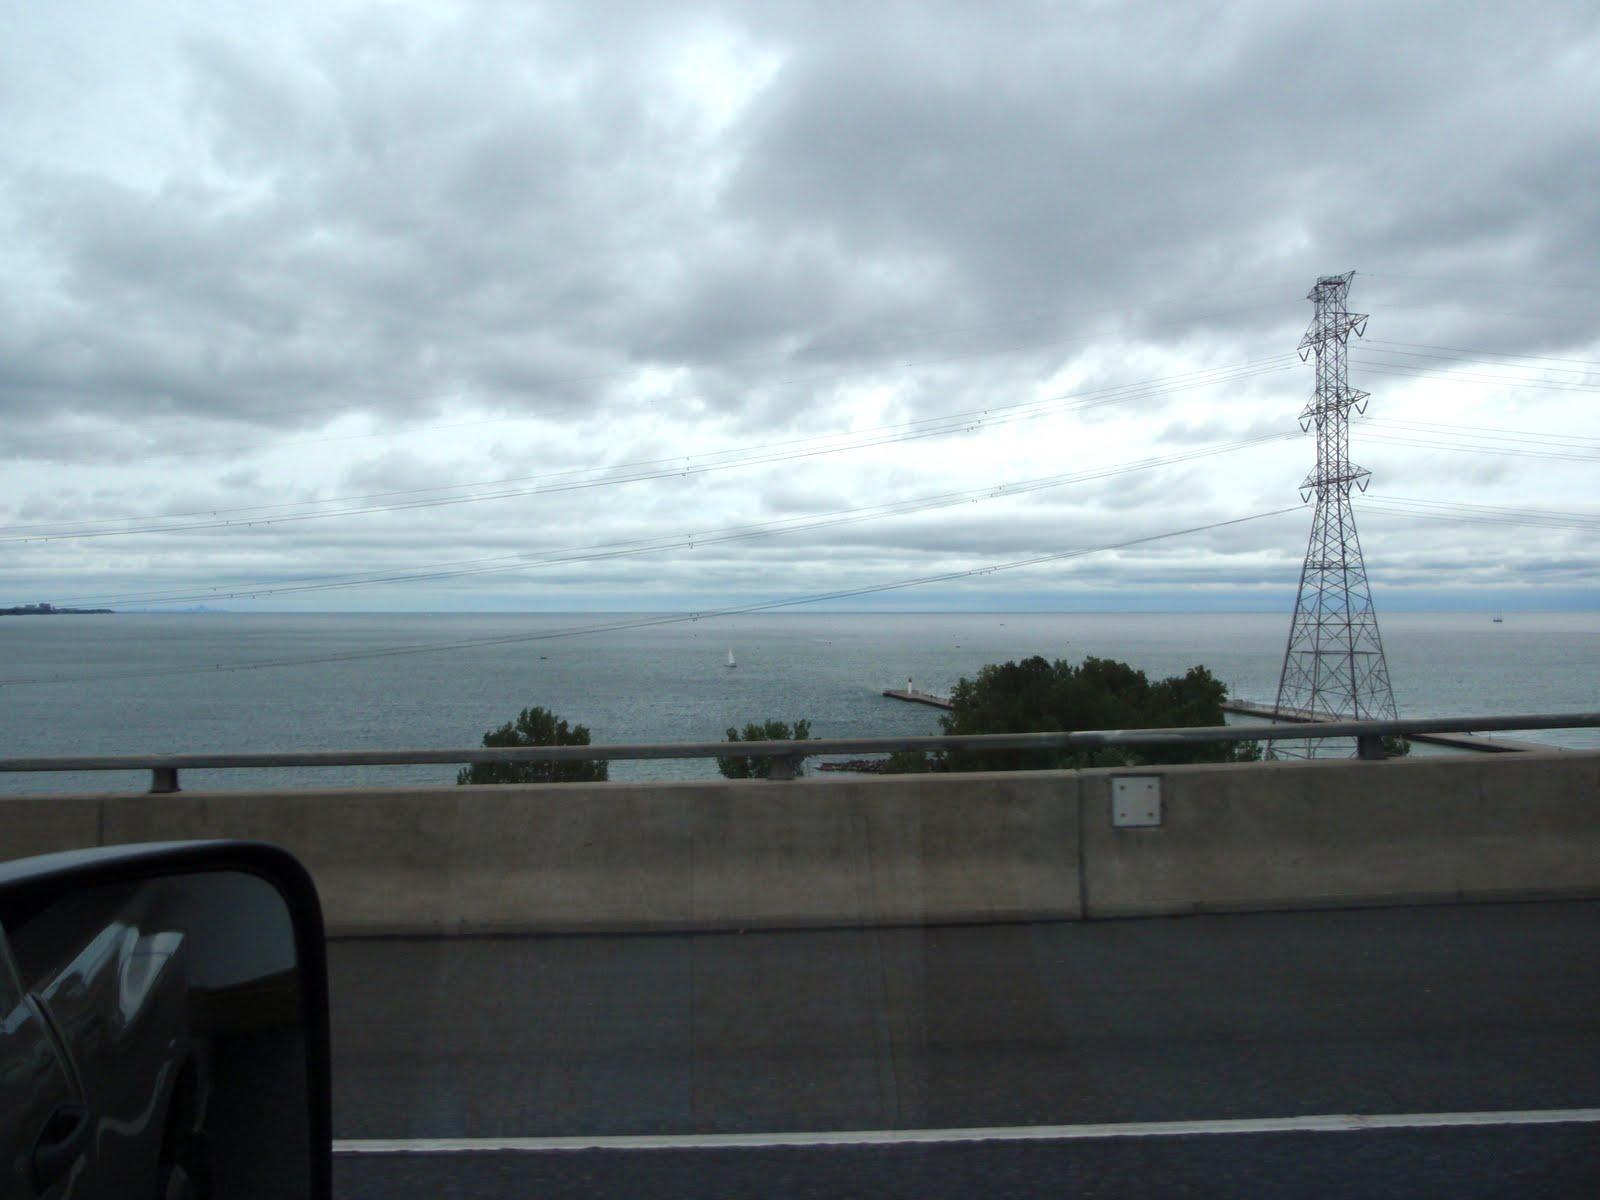 Driving along the lake